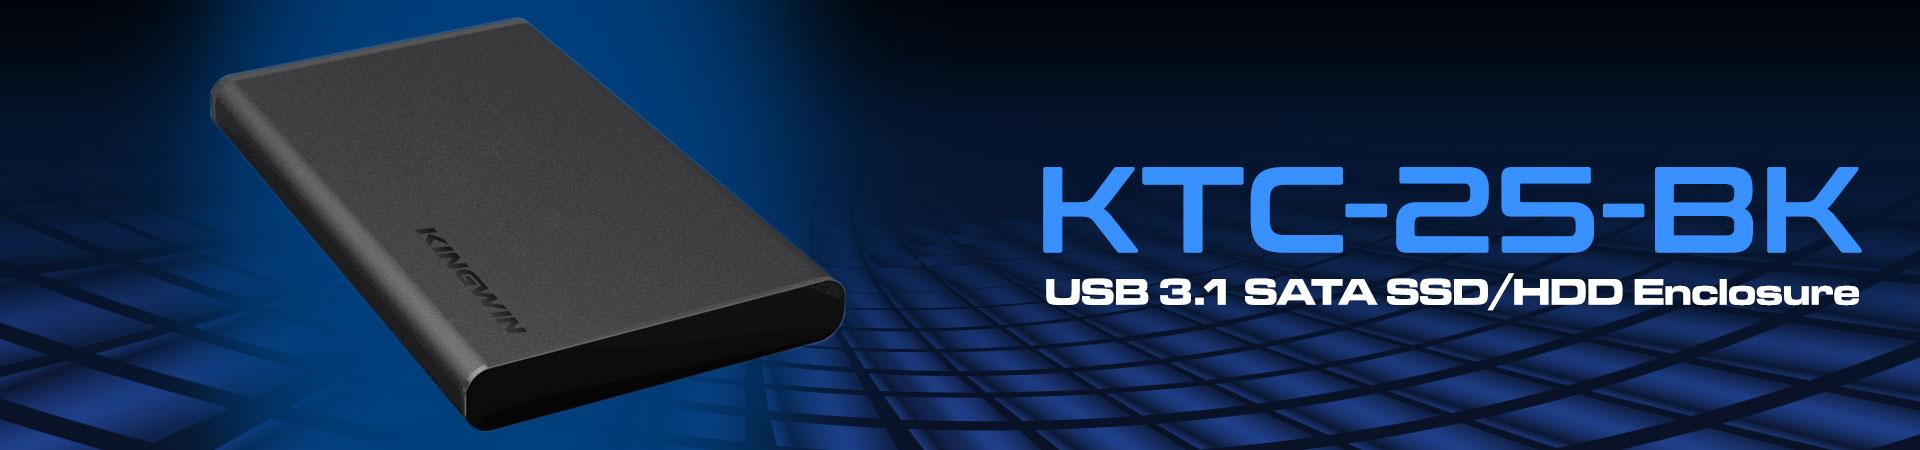 KTC-25-BK_BANNER